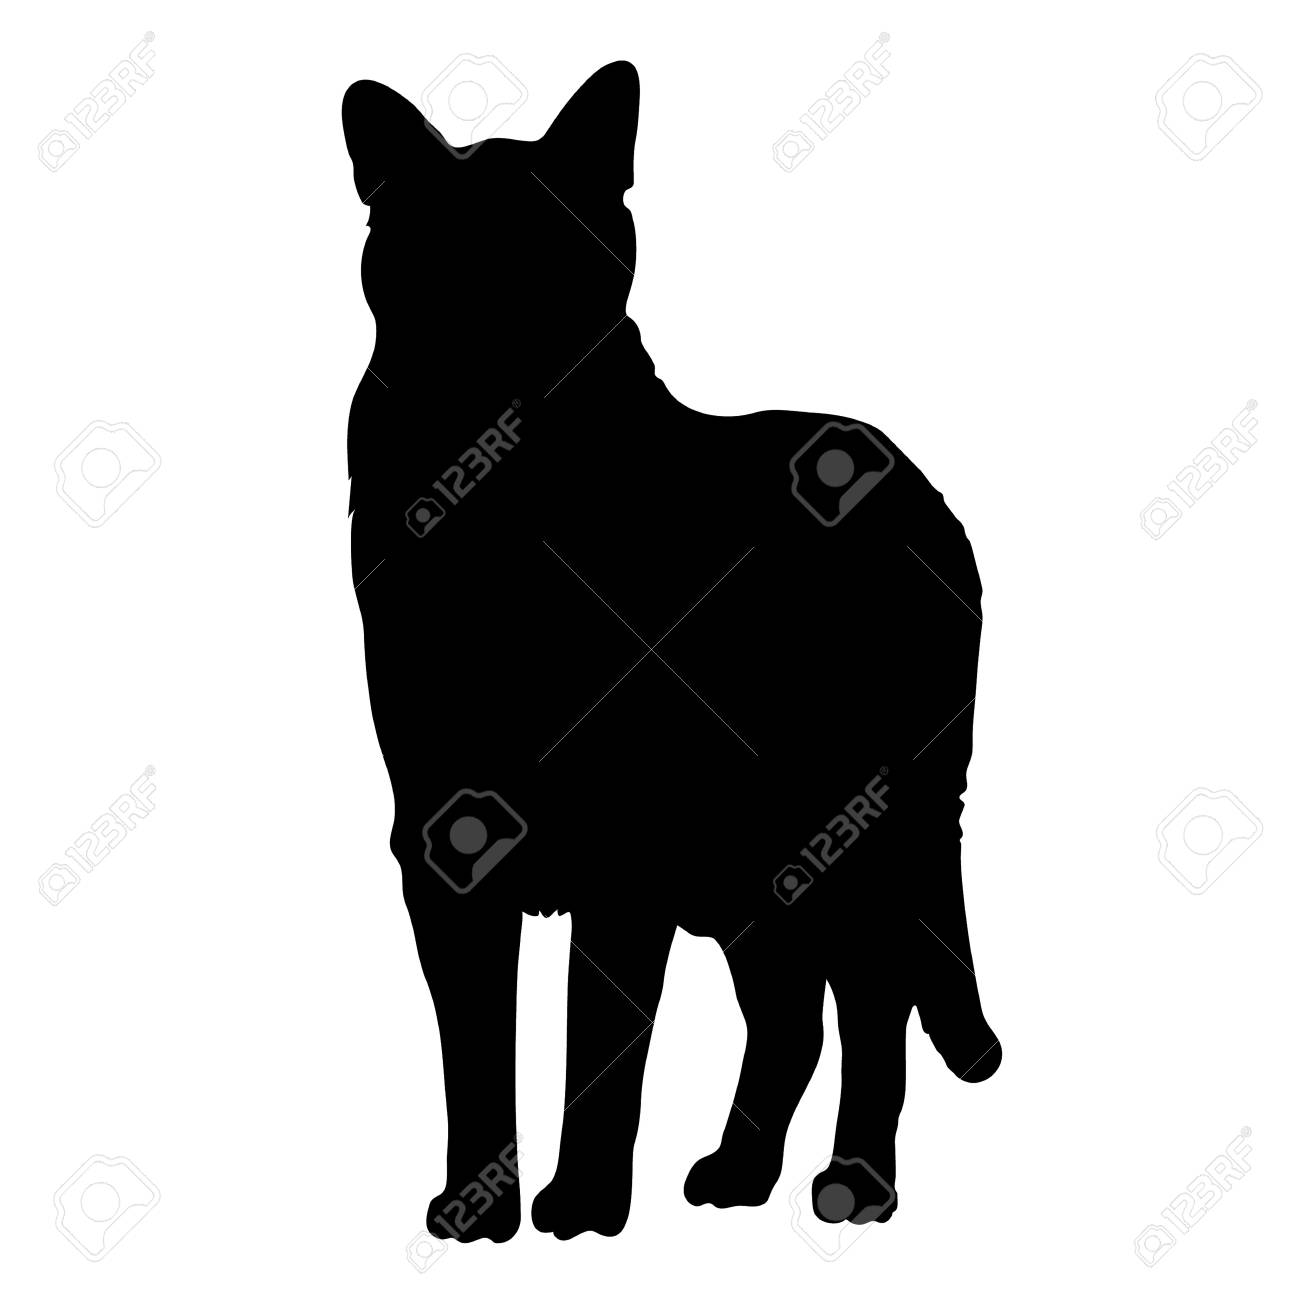 A black silhouette of a cat - 41855407